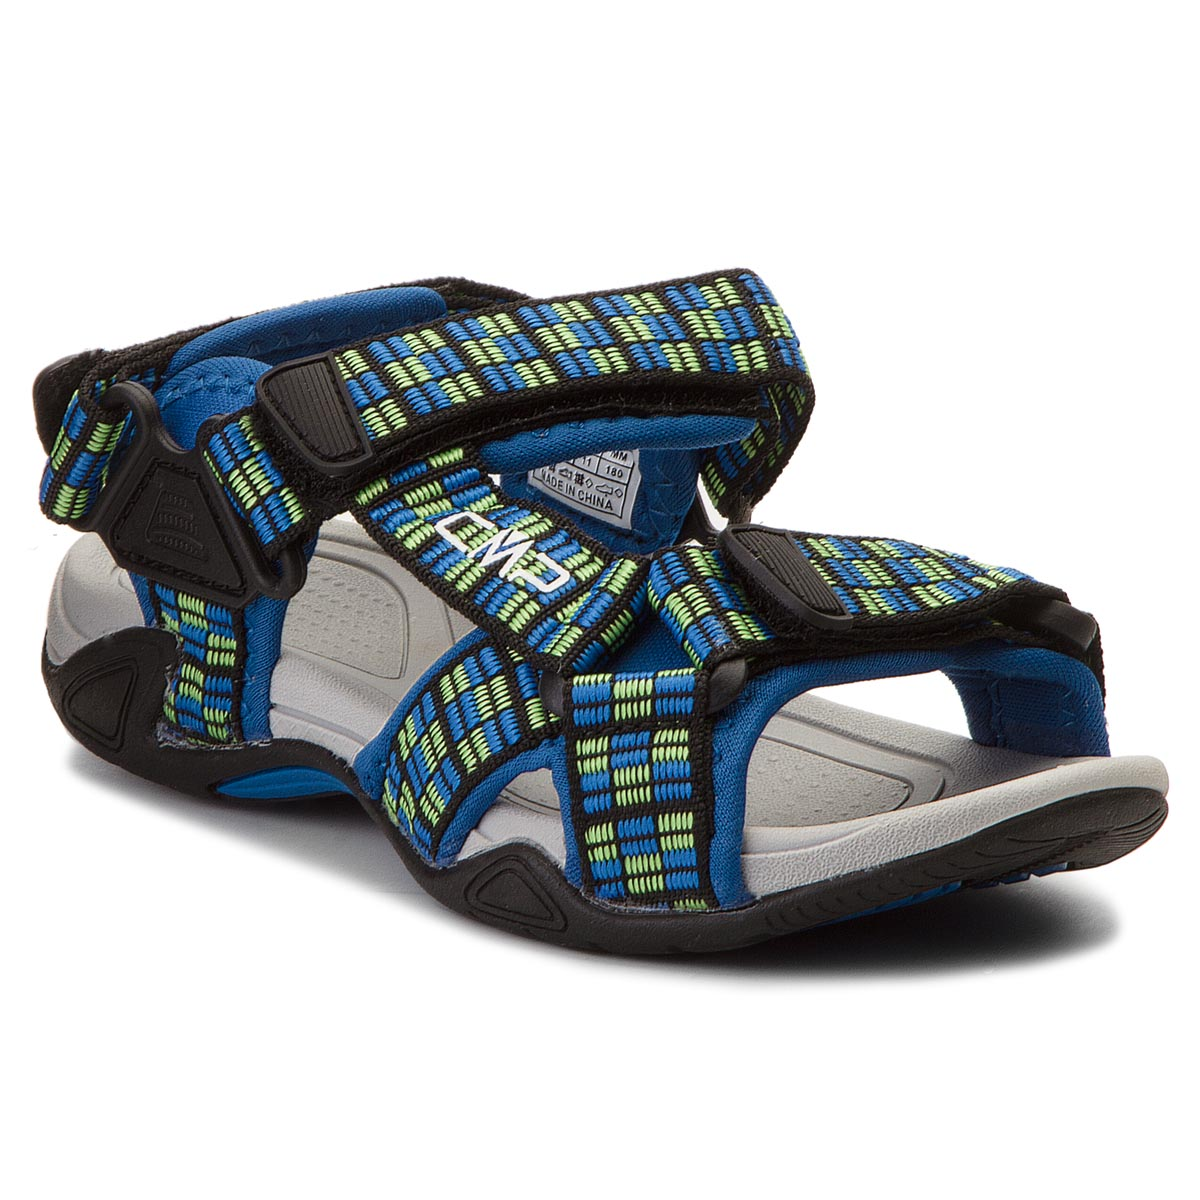 Sandály CMP - Kids Hamal Hiking Sandal 38Q9954 Zaffiro M974 - Glami.cz 2a6a1eec29